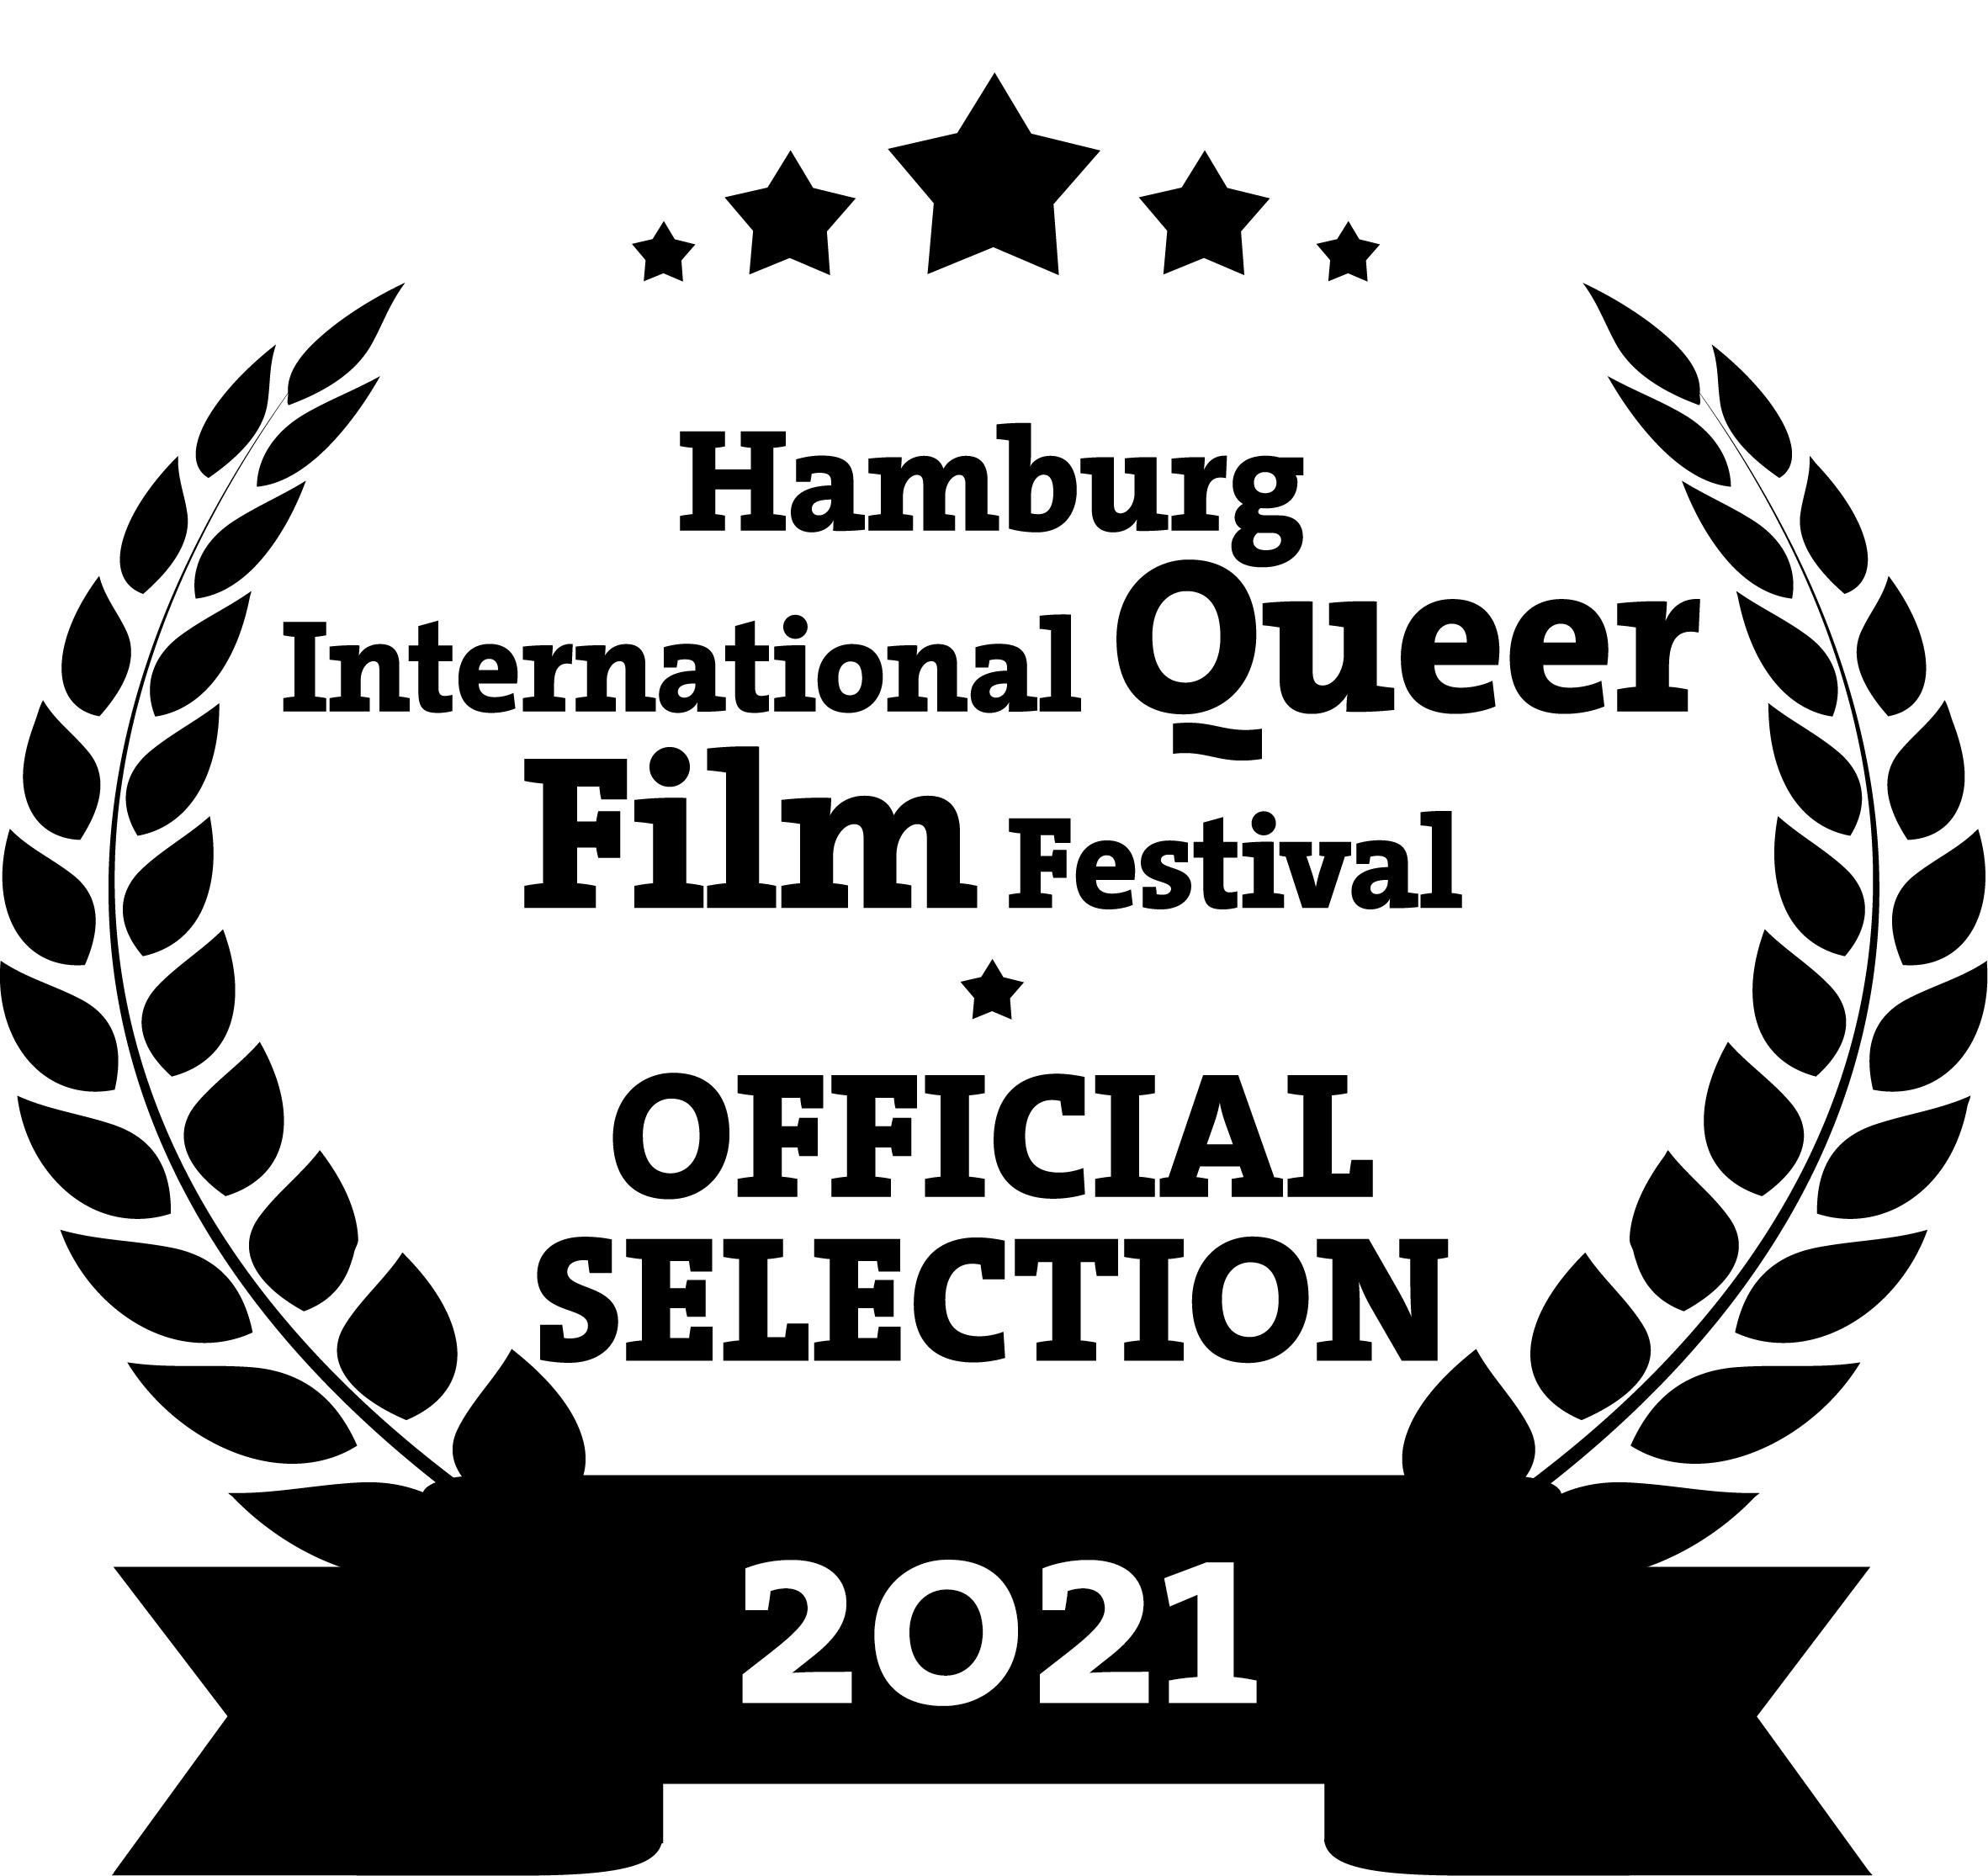 Hamburg International Queer Film Festival